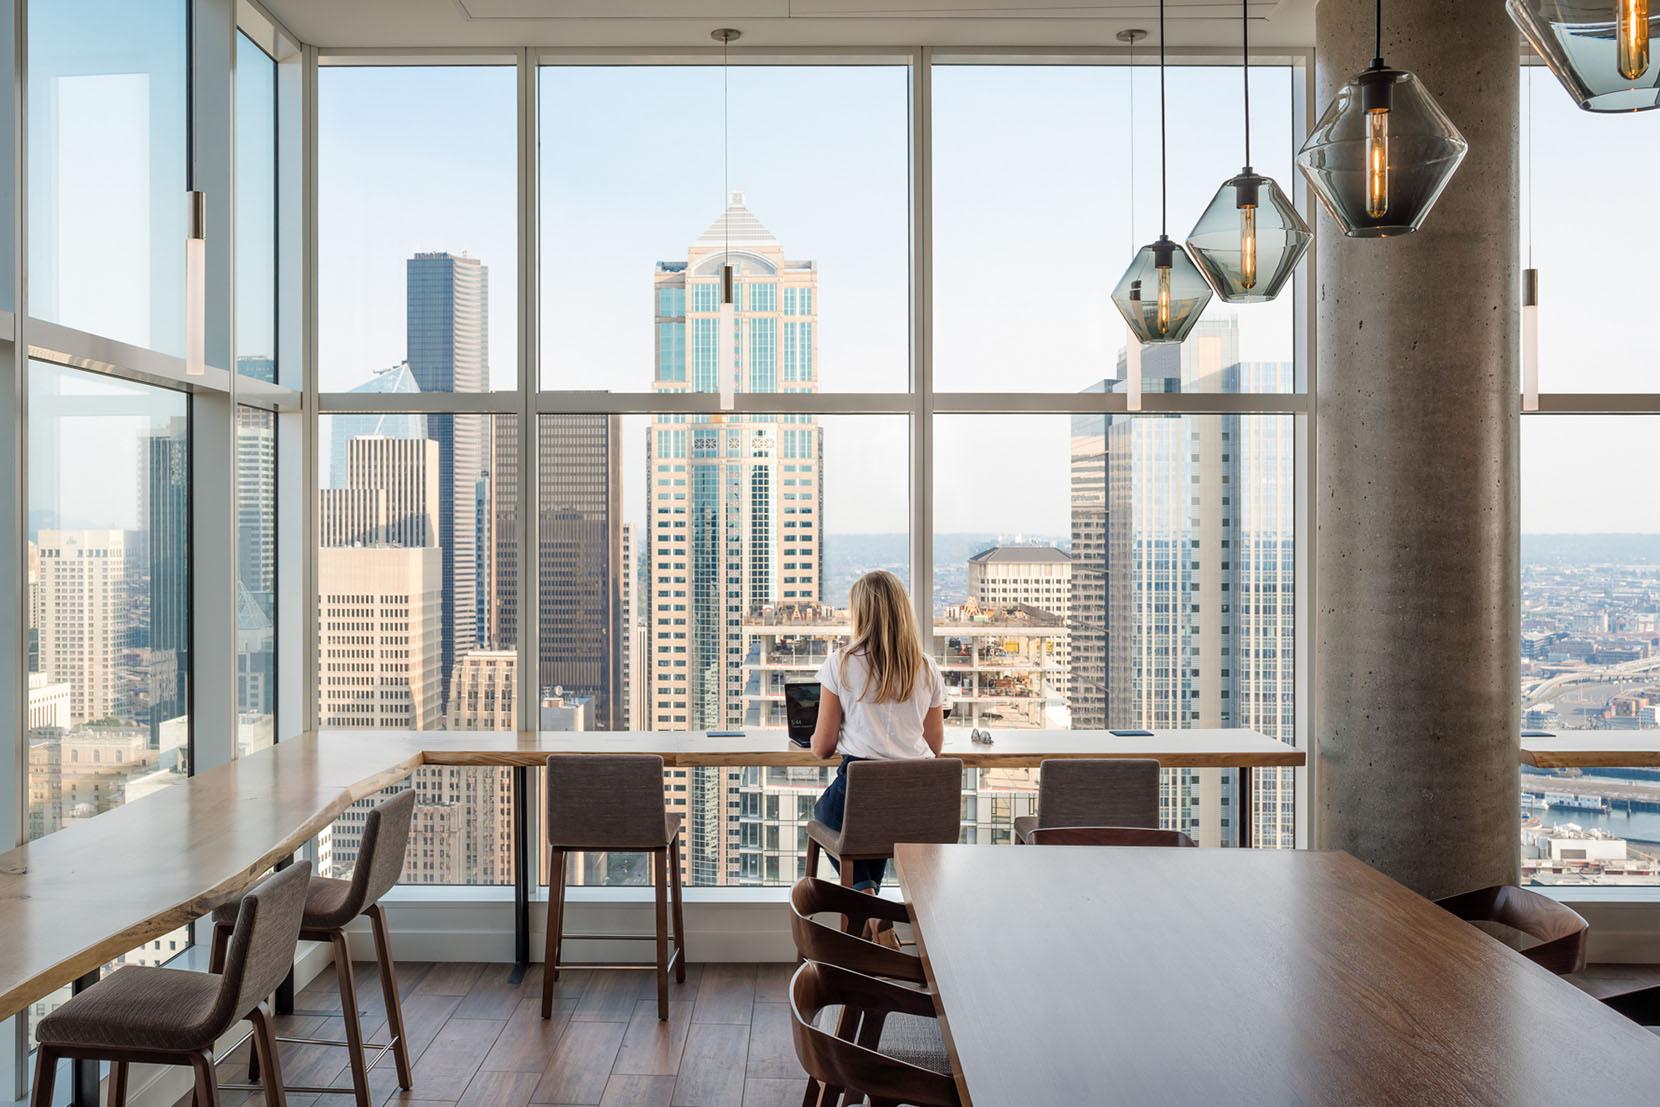 Modern-Iffice-Lighting-Helios-Office-Gray-Troves.jpg